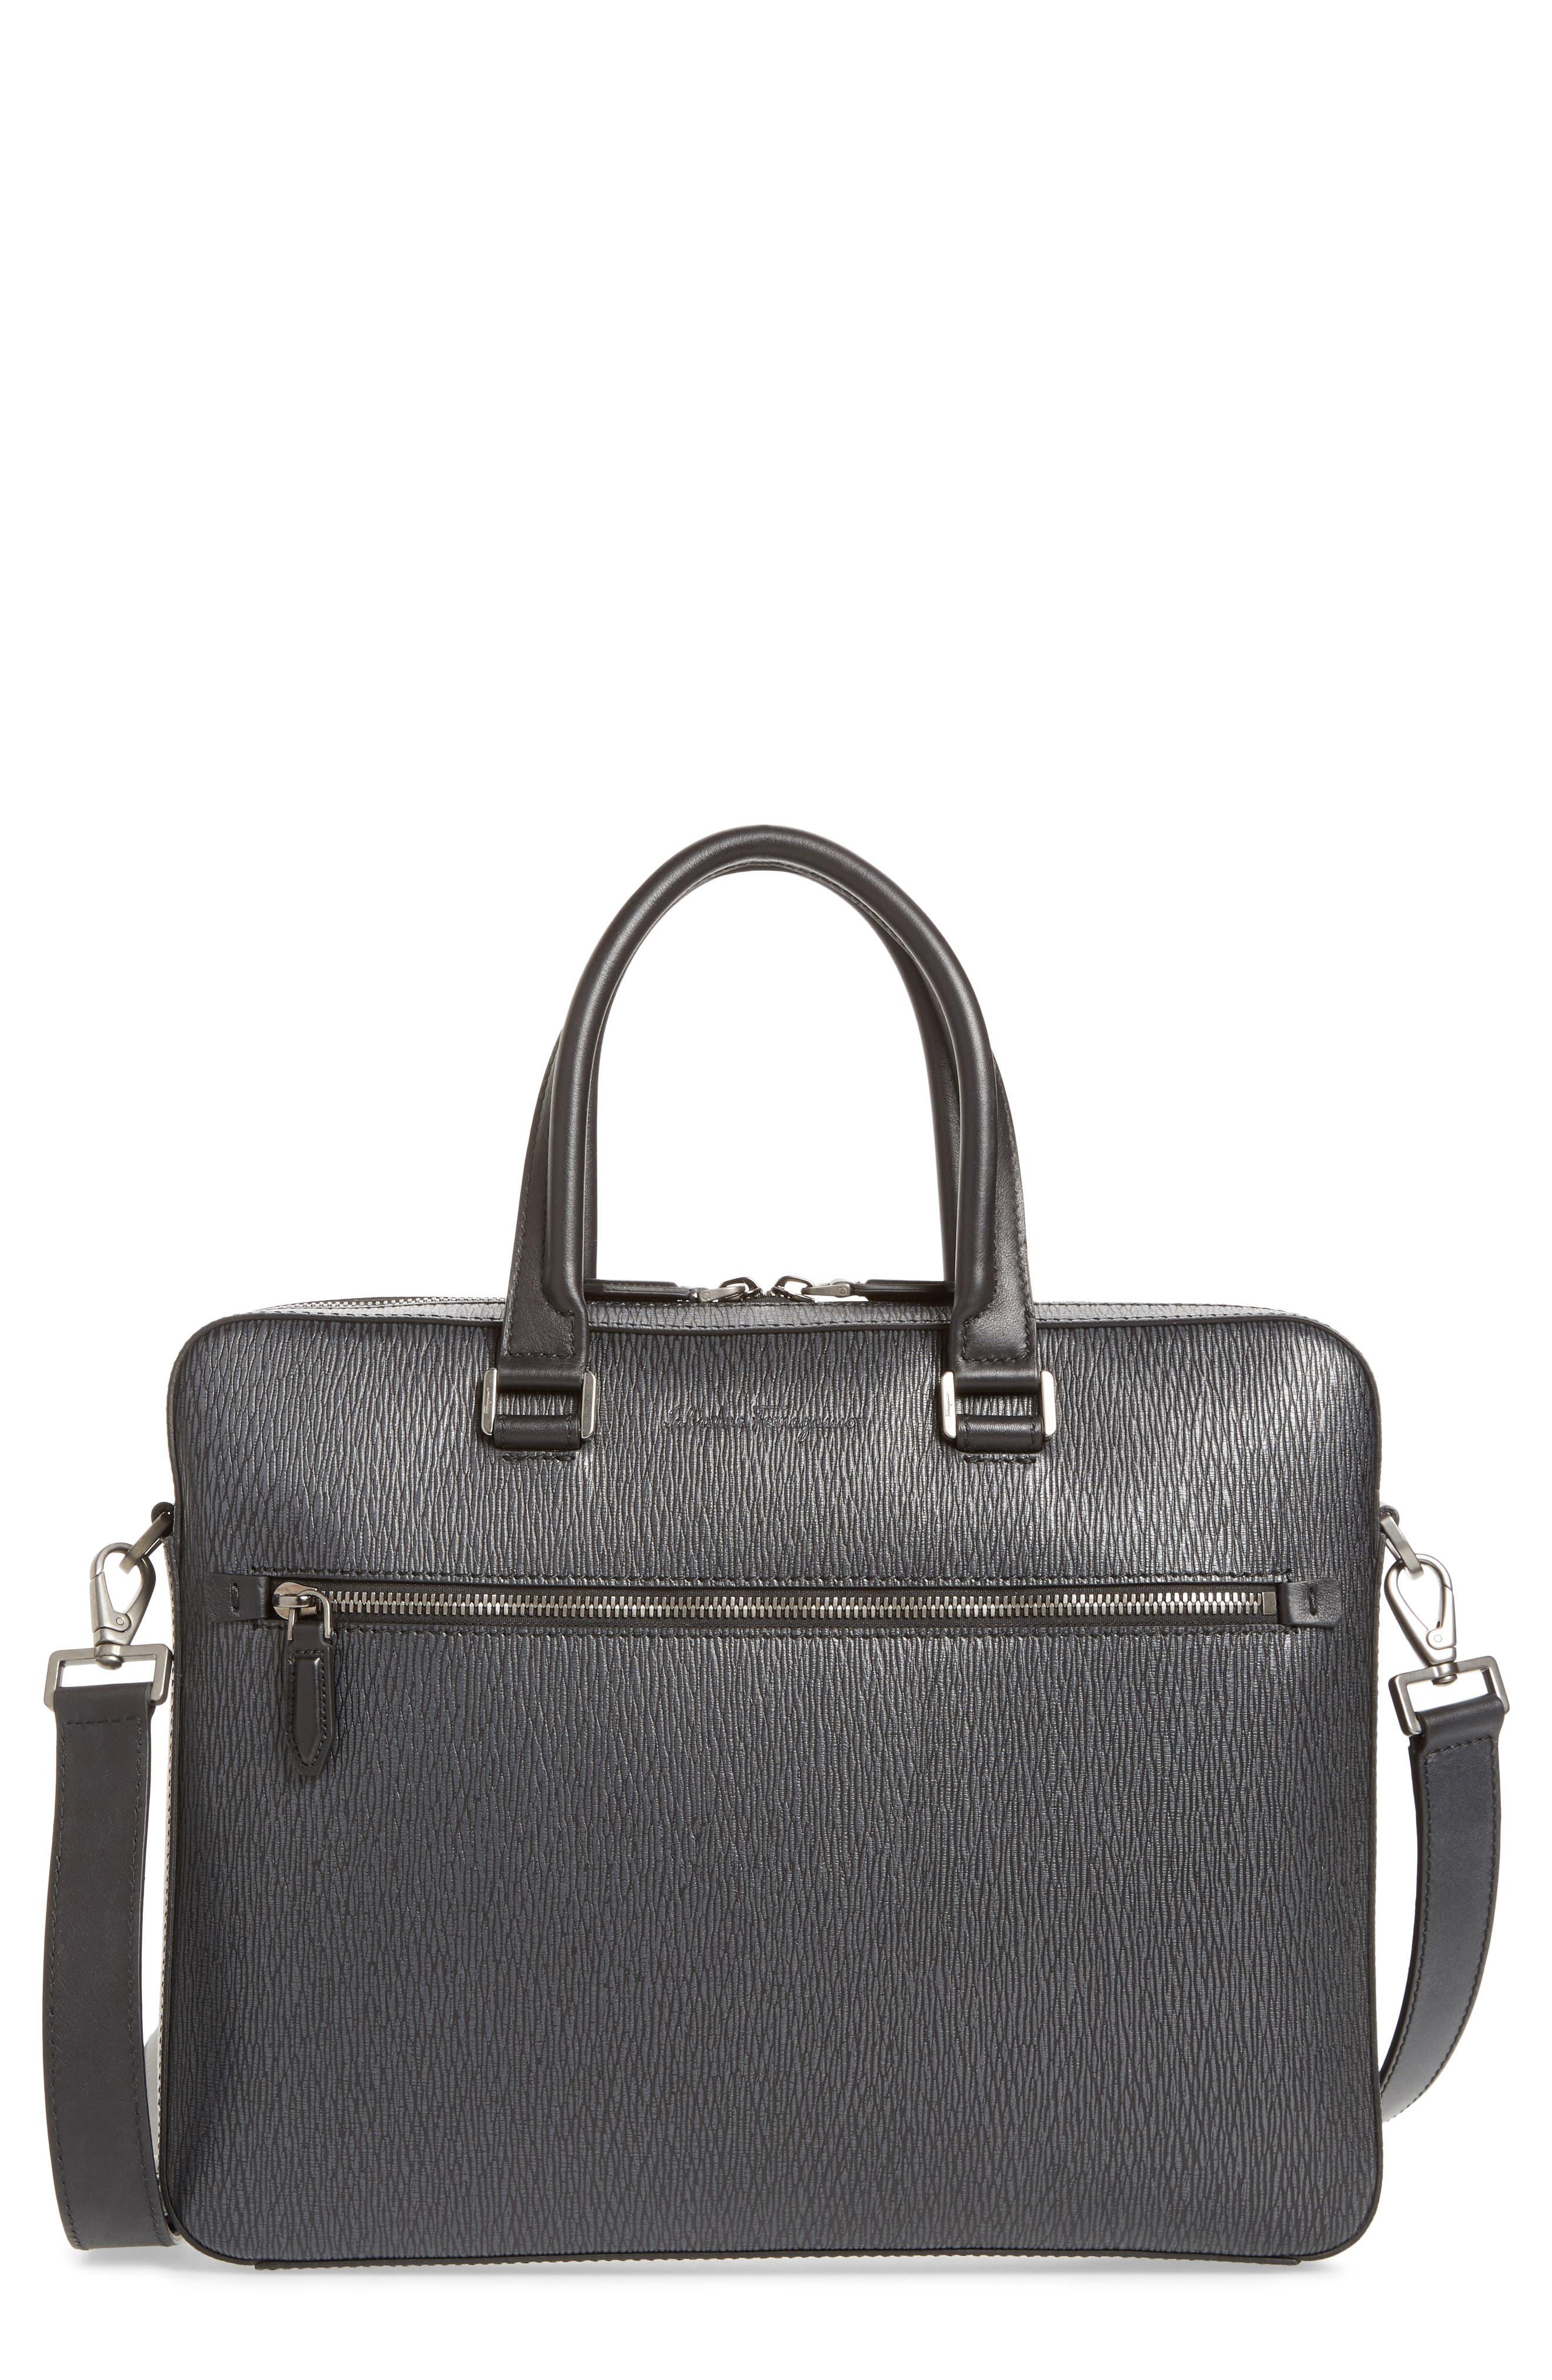 SALVATORE FERRAGAMO, Textured Leather Briefcase, Main thumbnail 1, color, GRIGIO/ NERO